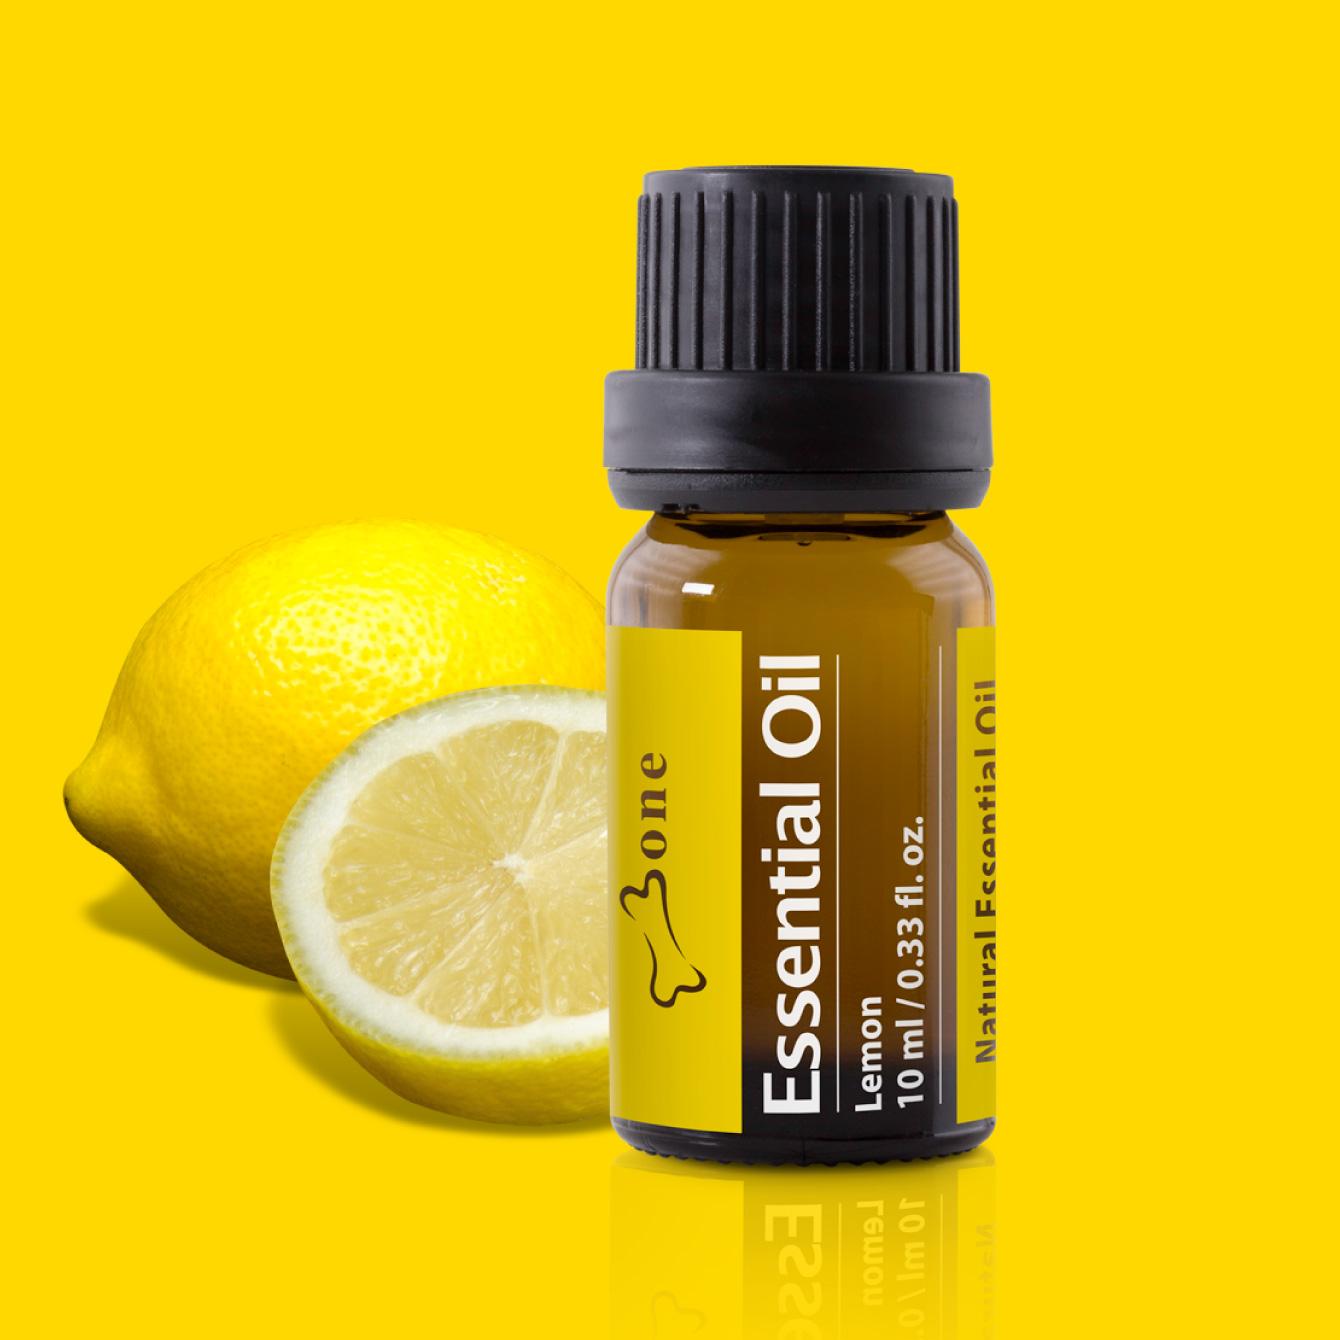 【Bone】檸檬精油 Essential Oil - Lemon 10ml